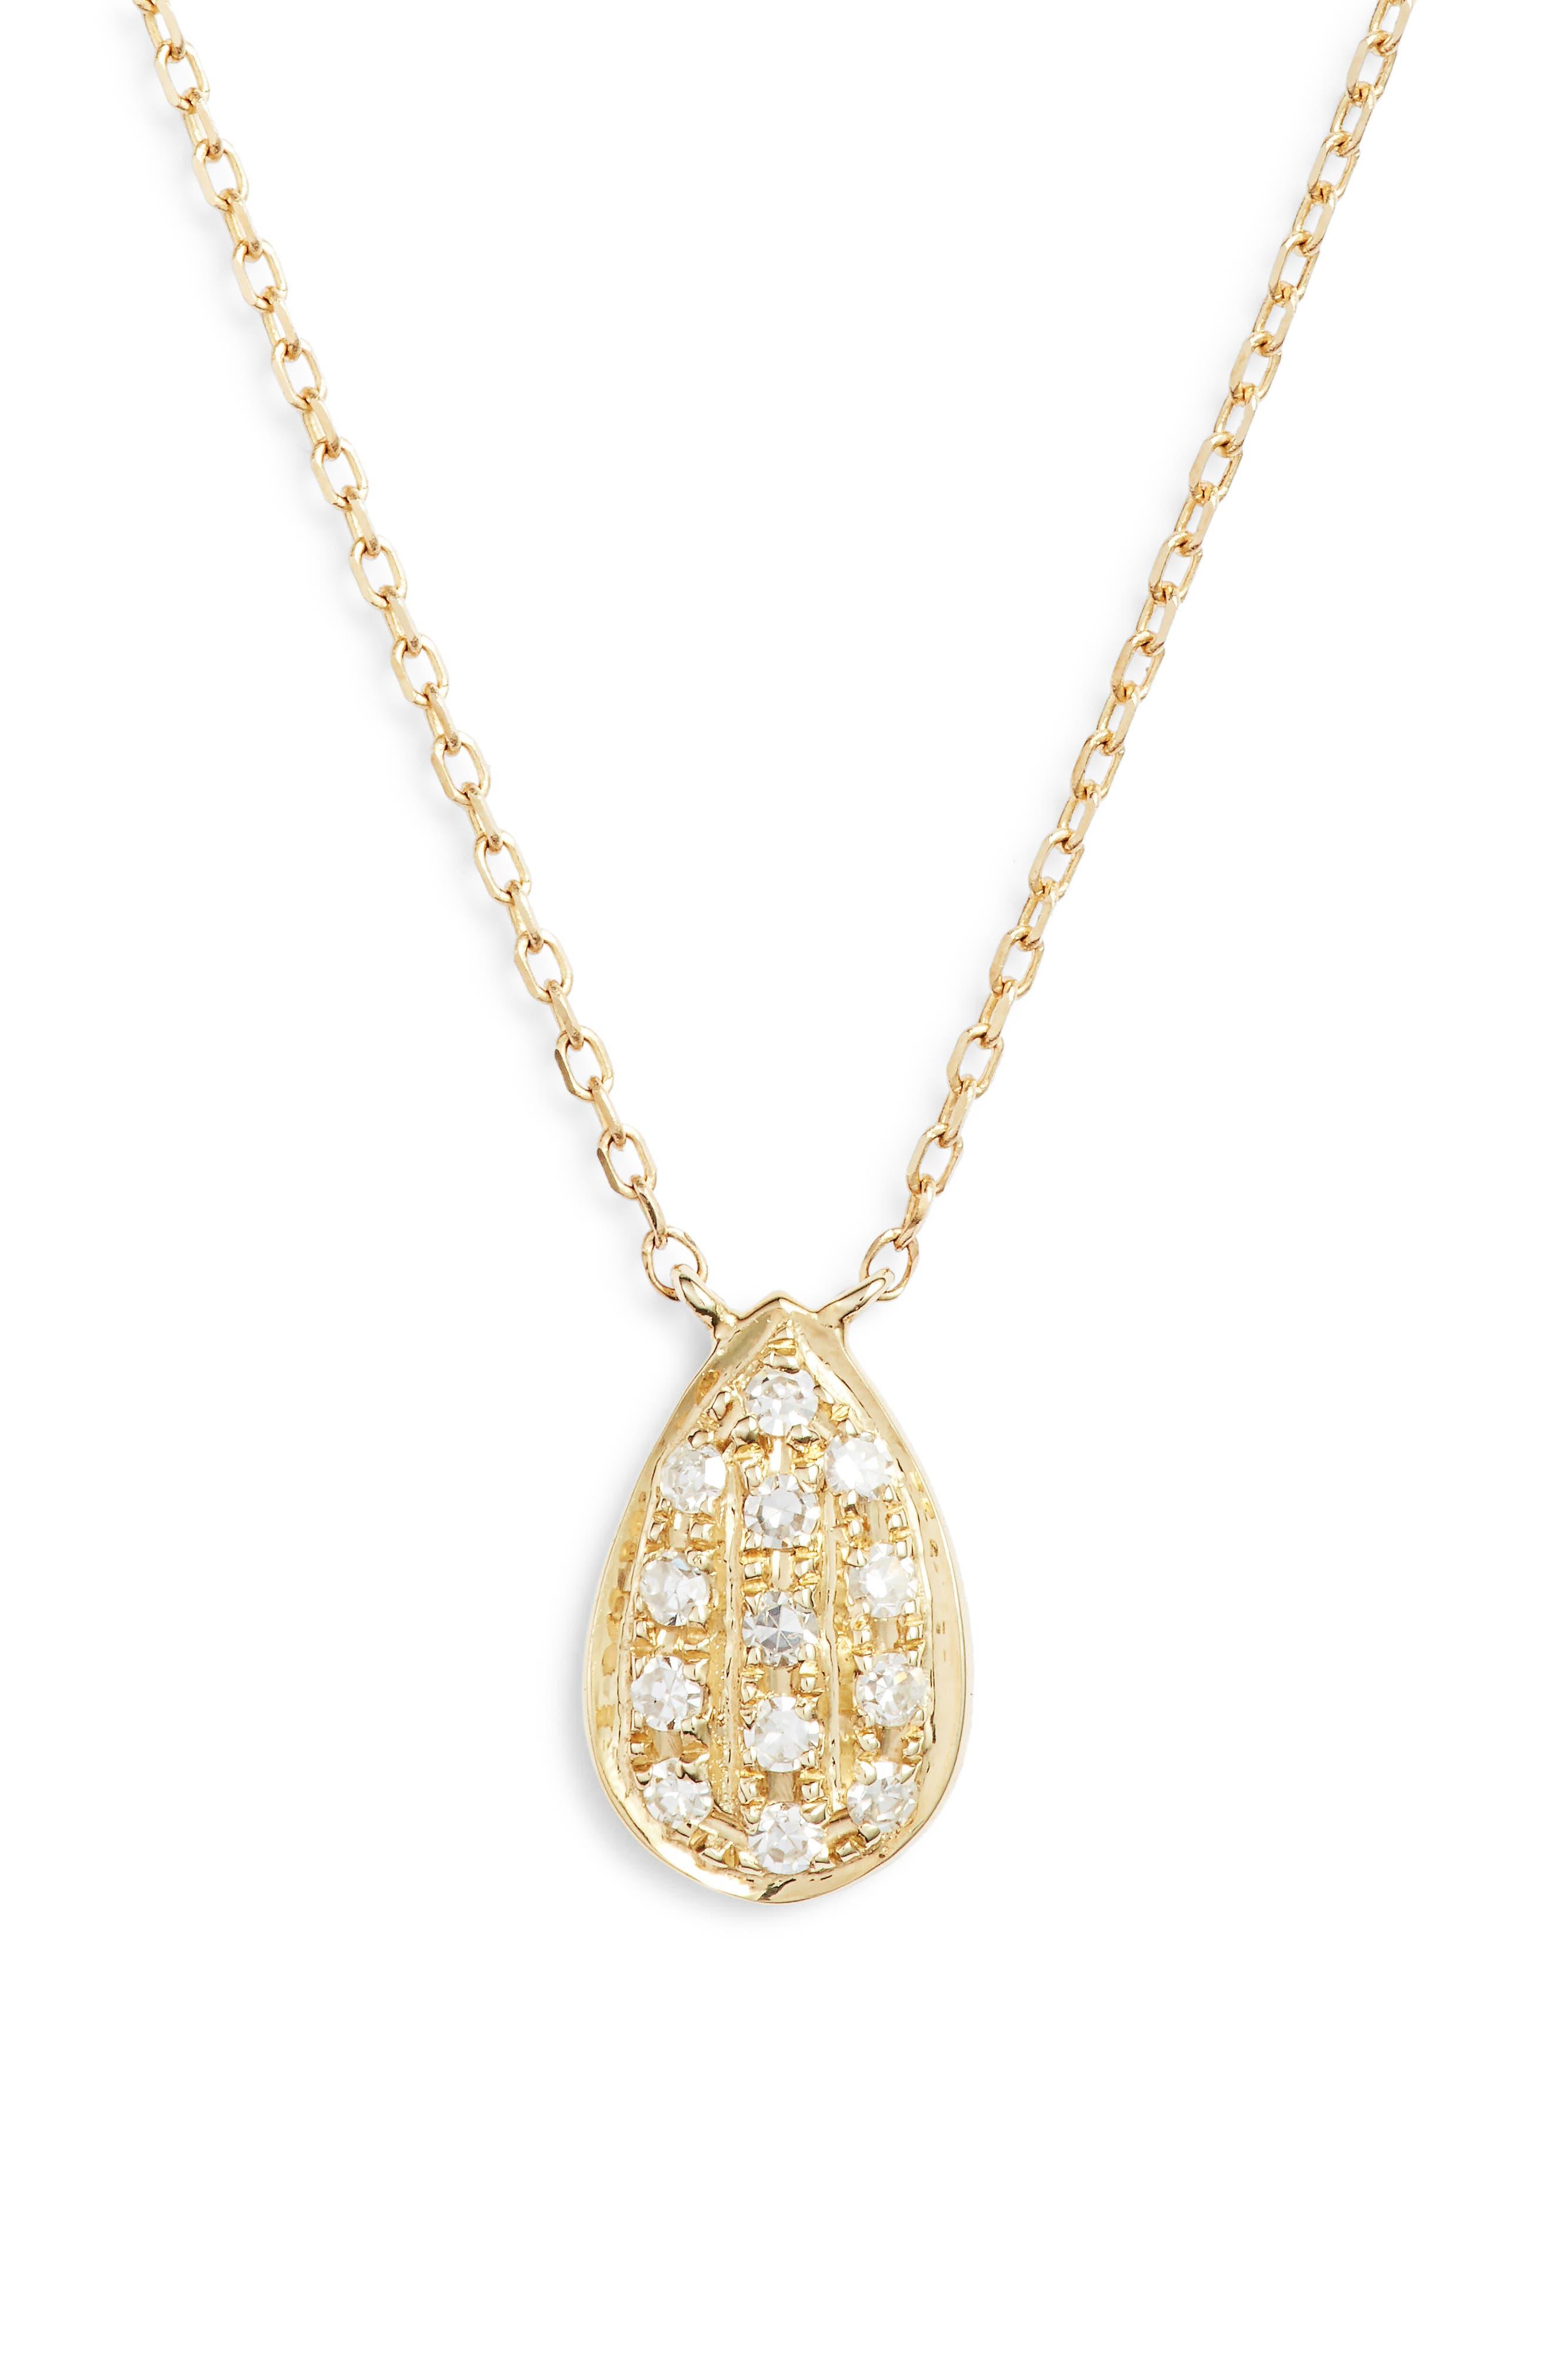 DANA REBECCA DESIGNS, Samantha Lynn Diamond Pendant Necklace, Main thumbnail 1, color, 710